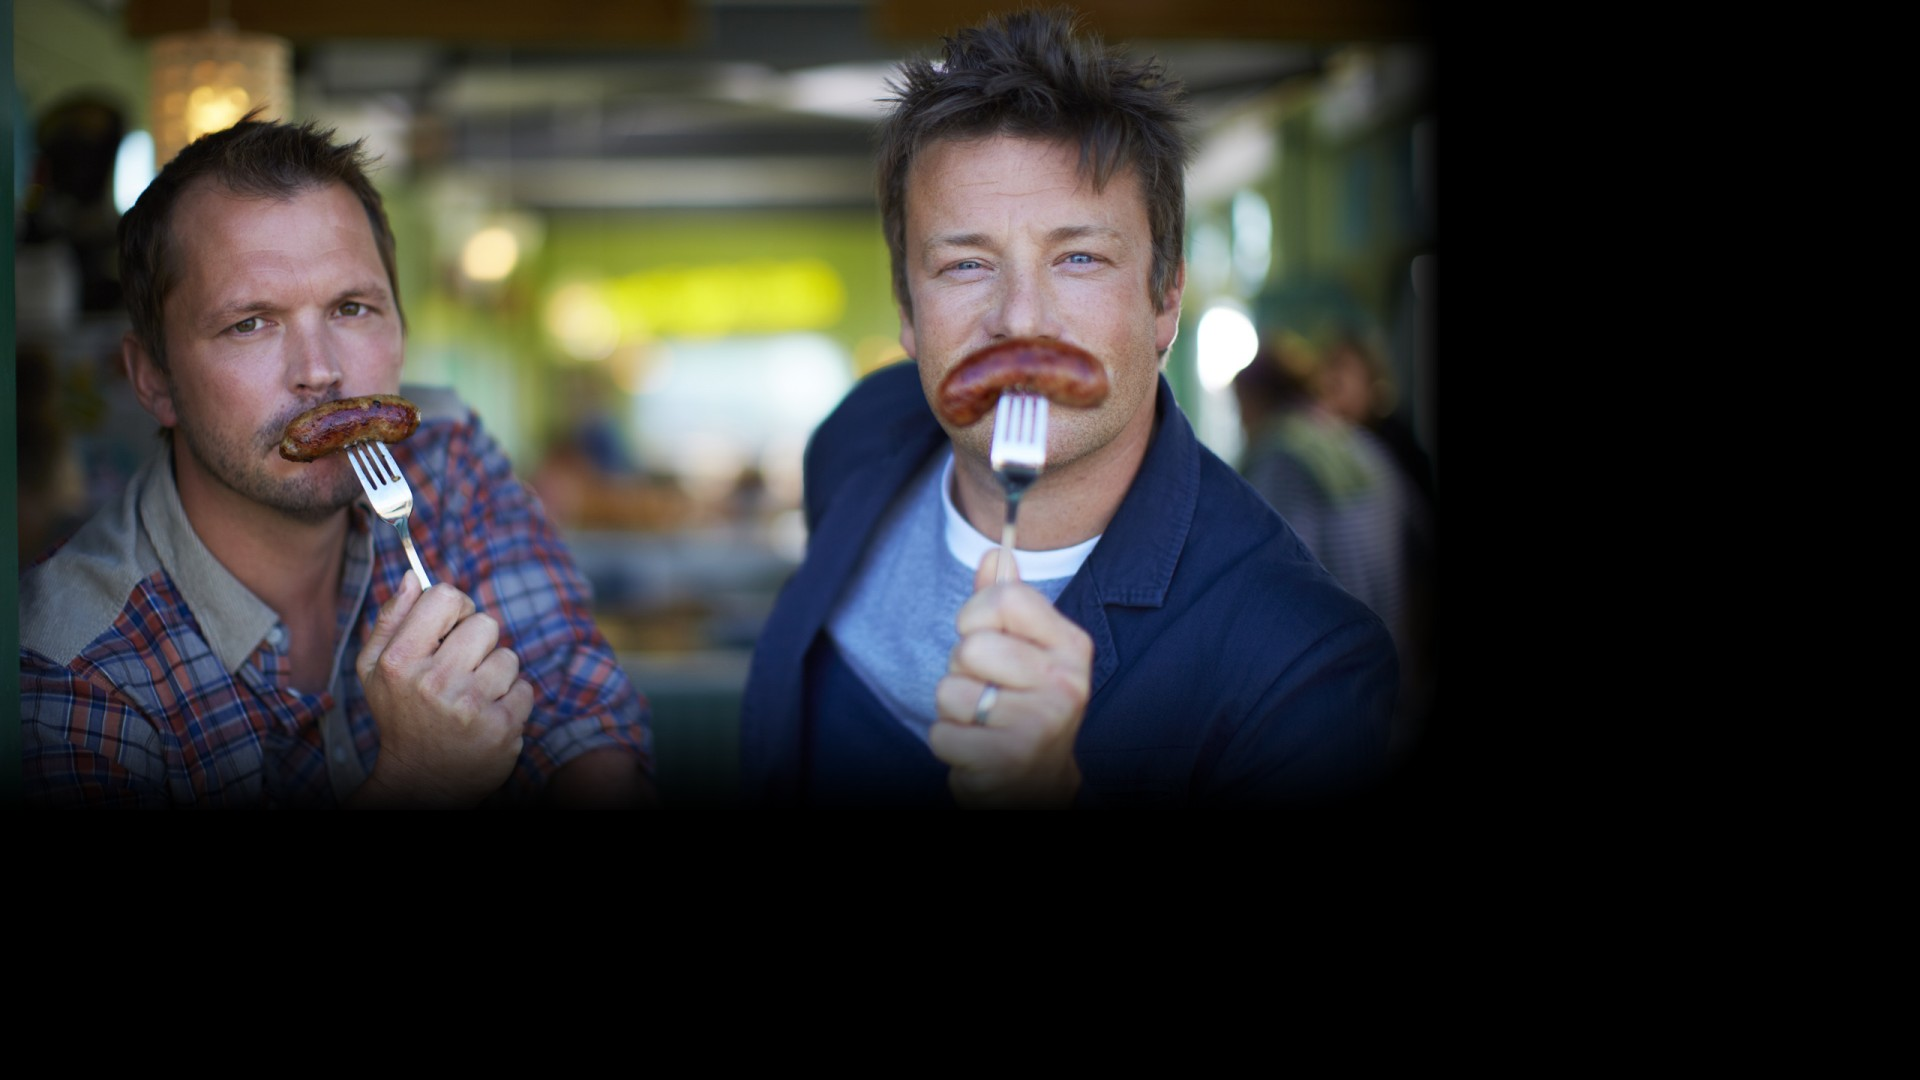 food fight club imdb